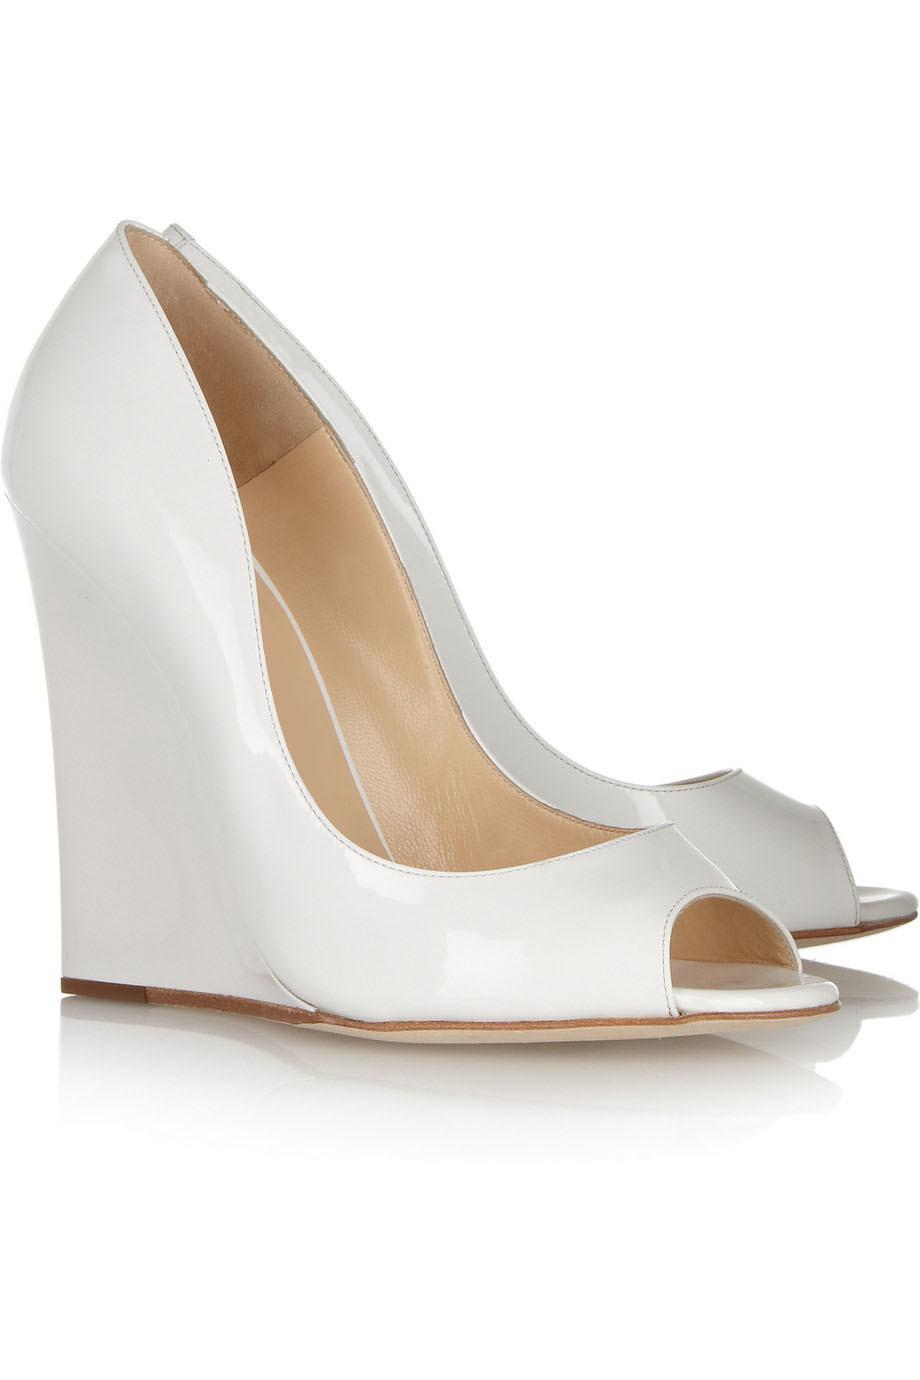 White Thick Heels